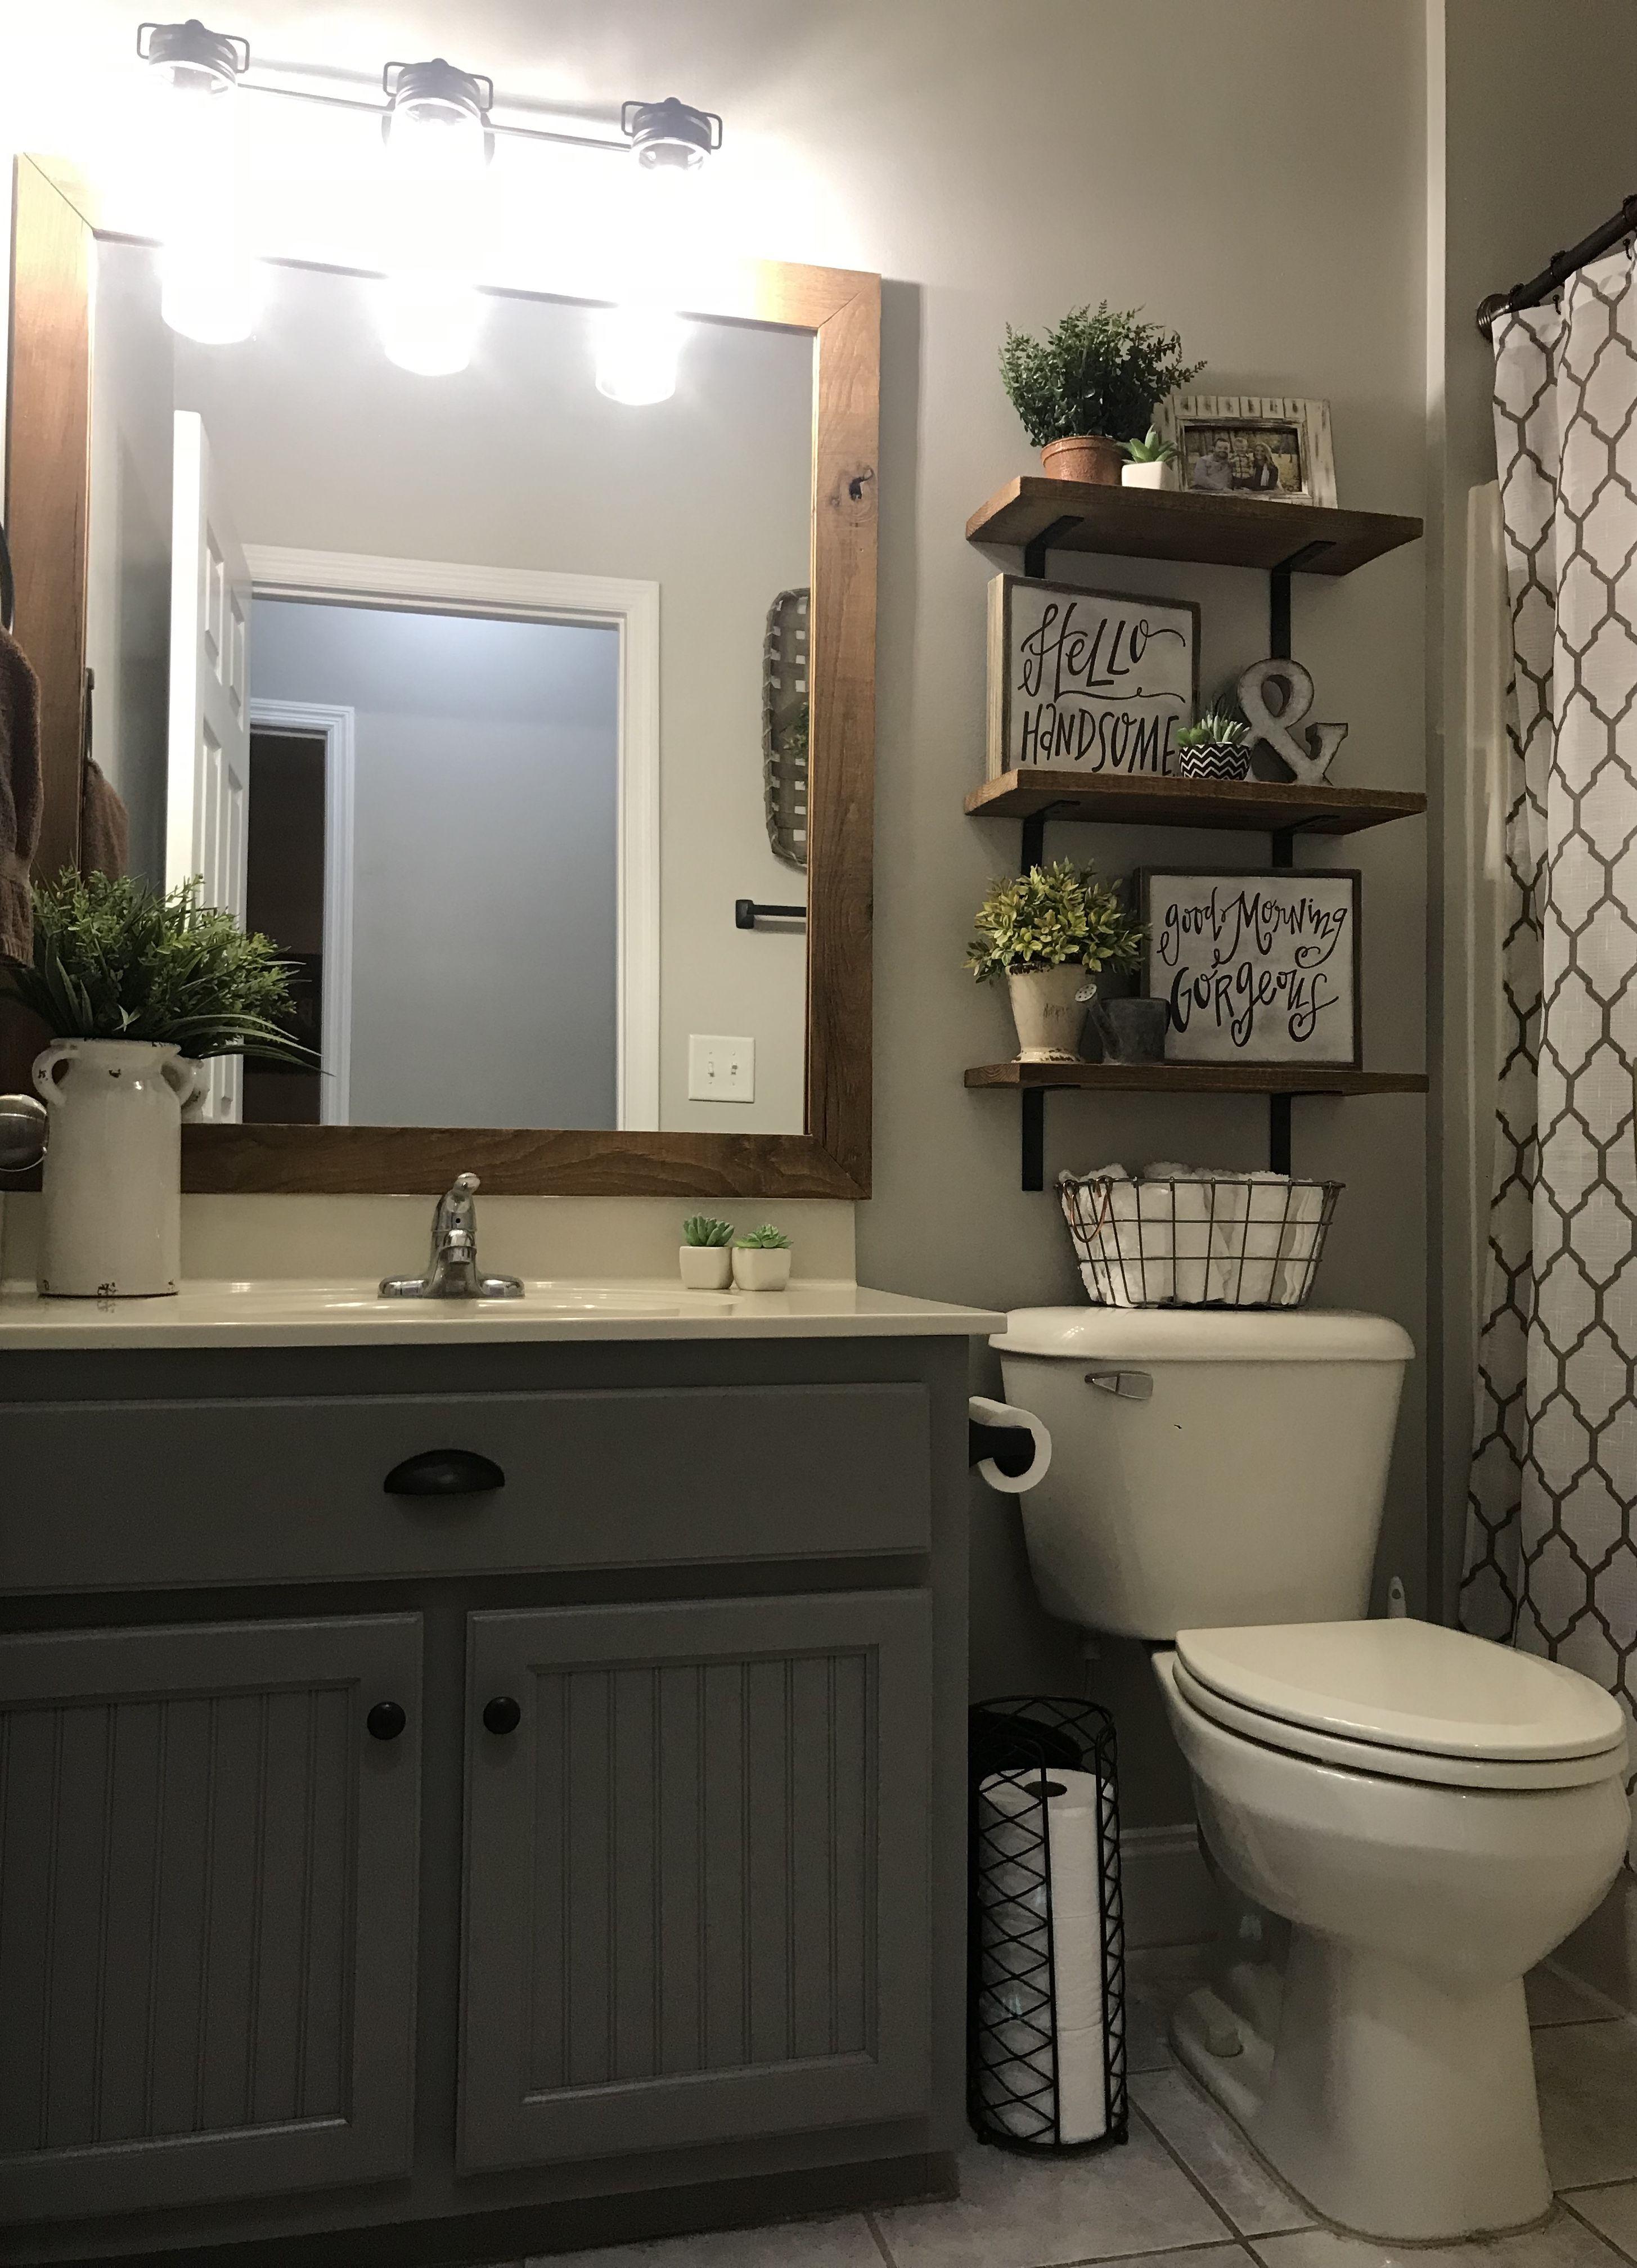 Guest Bathroom Idea Small Bathroom Decor Guest Bathrooms Farmhouse Bathroom Decor